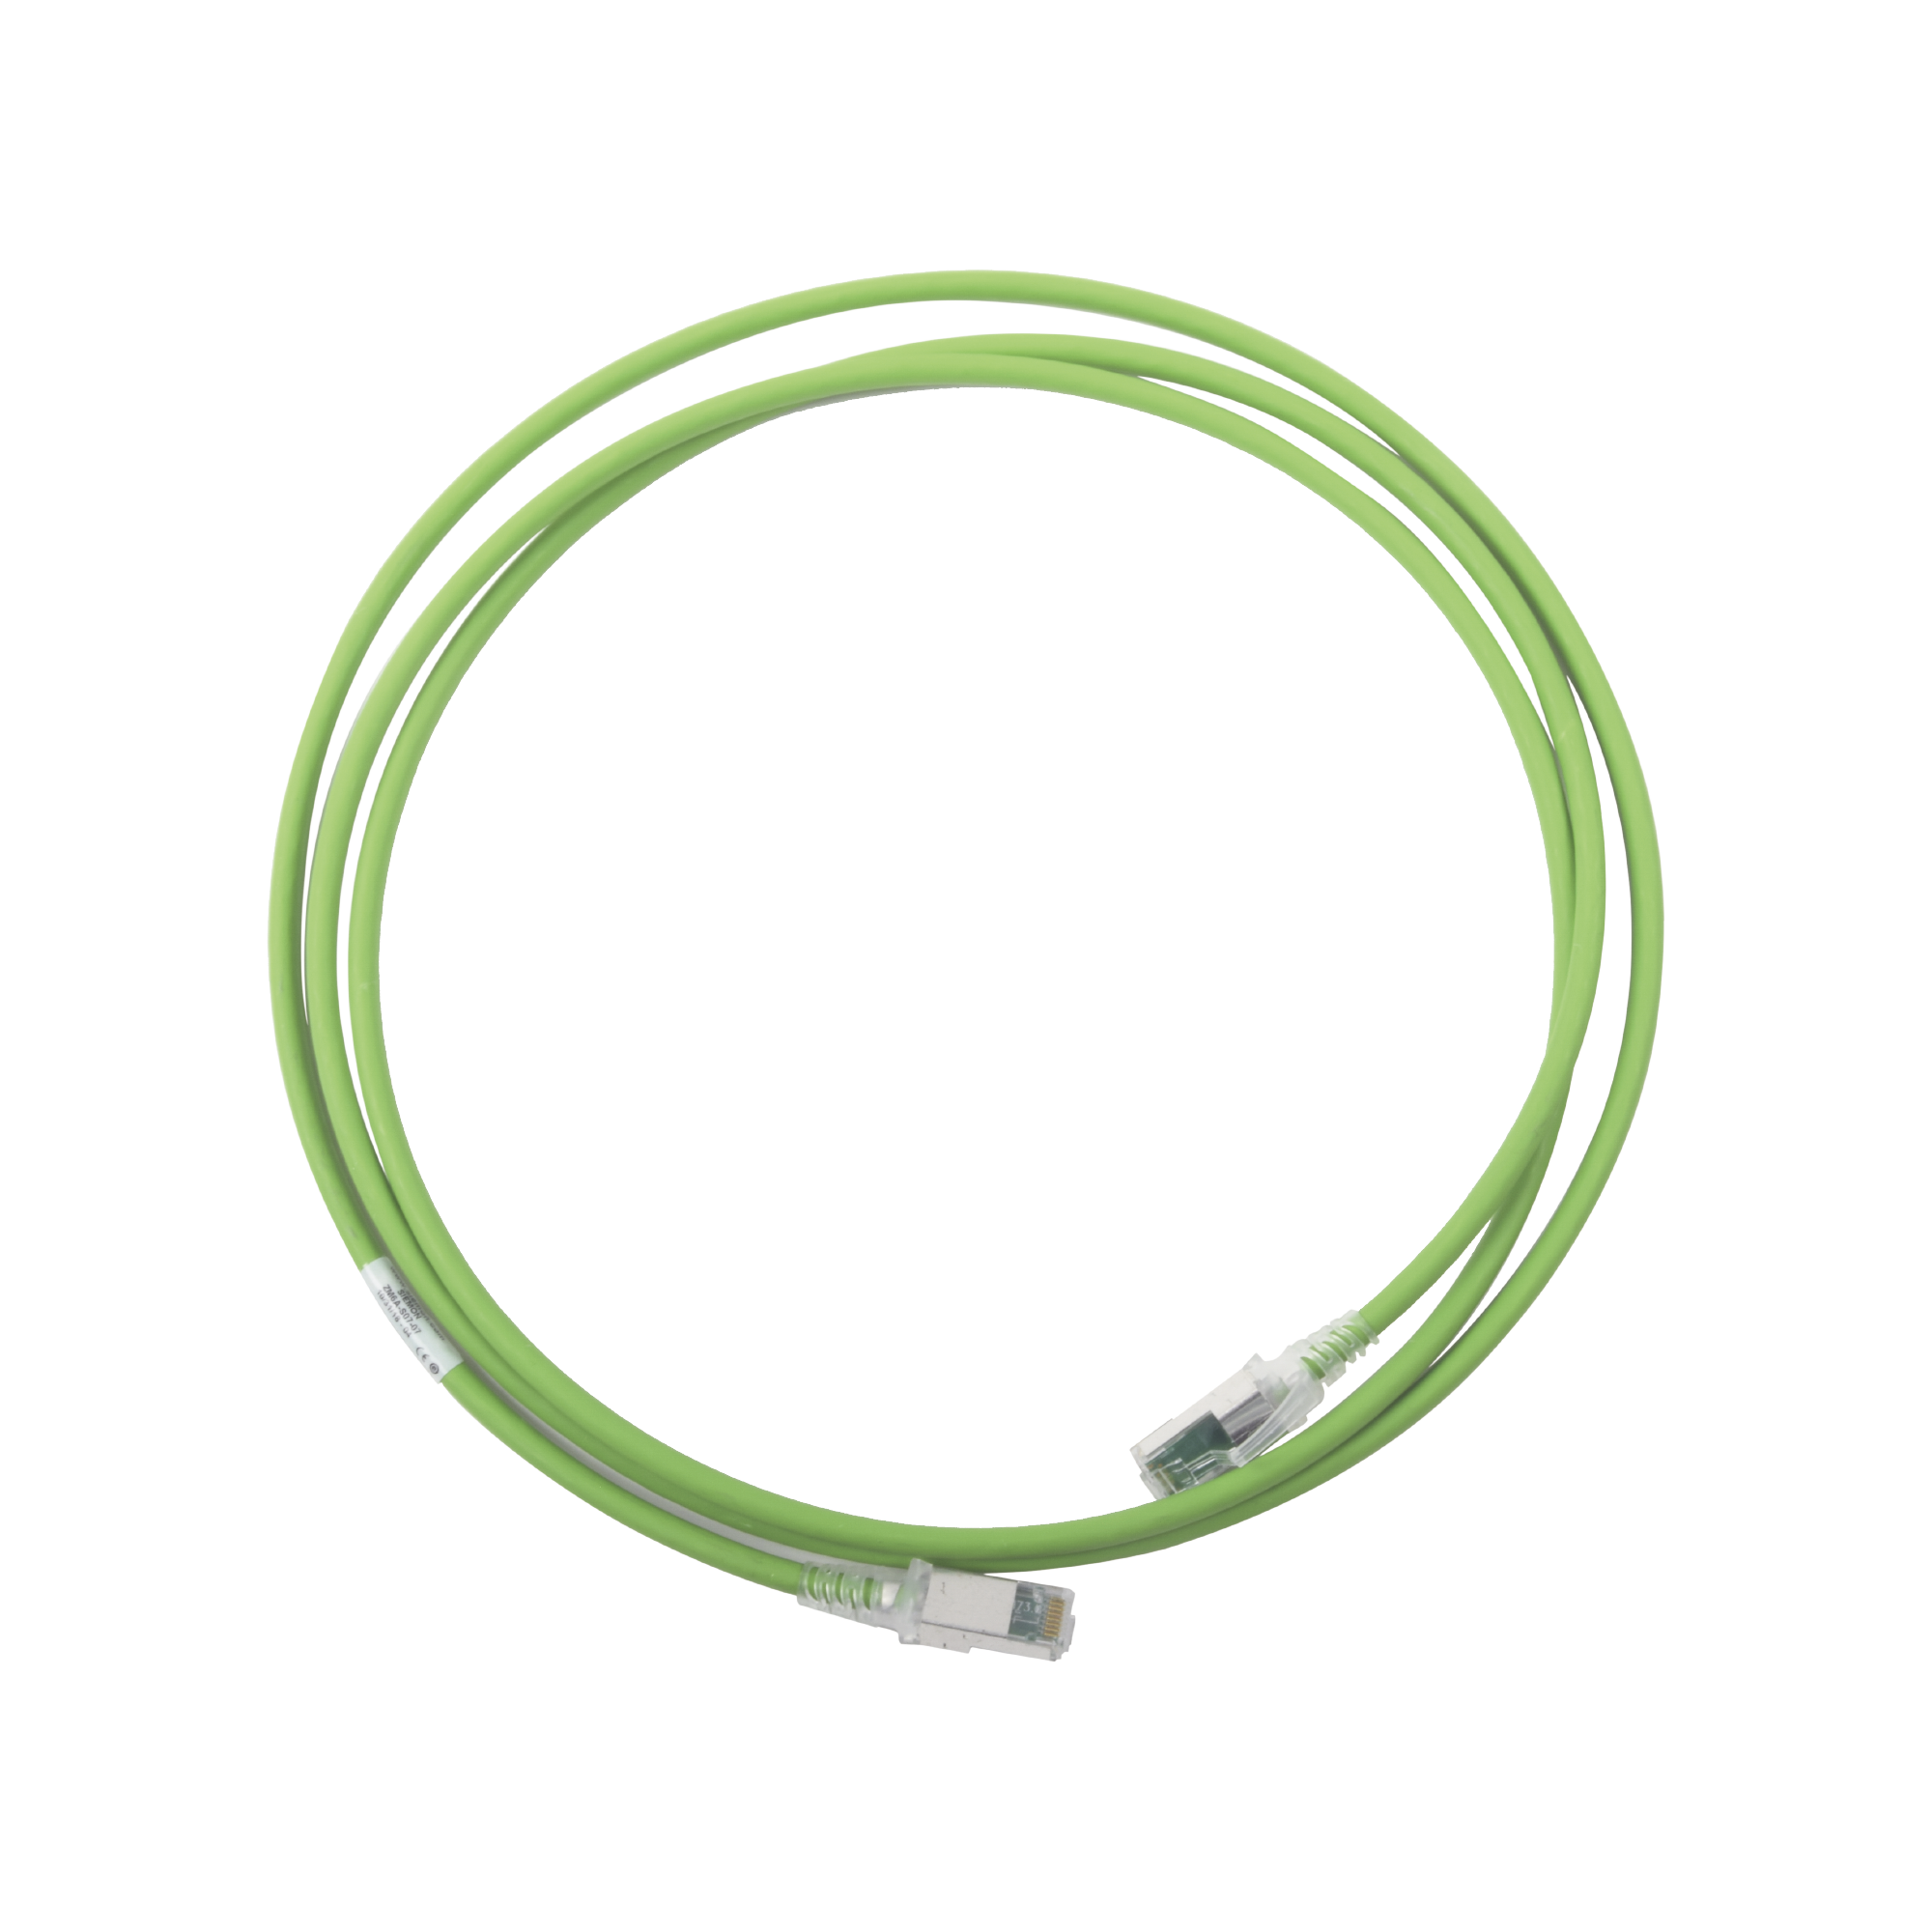 Patch Cord Z-MAX Cat6A S/FTP, CM/LS0H, 7ft, Color Verde